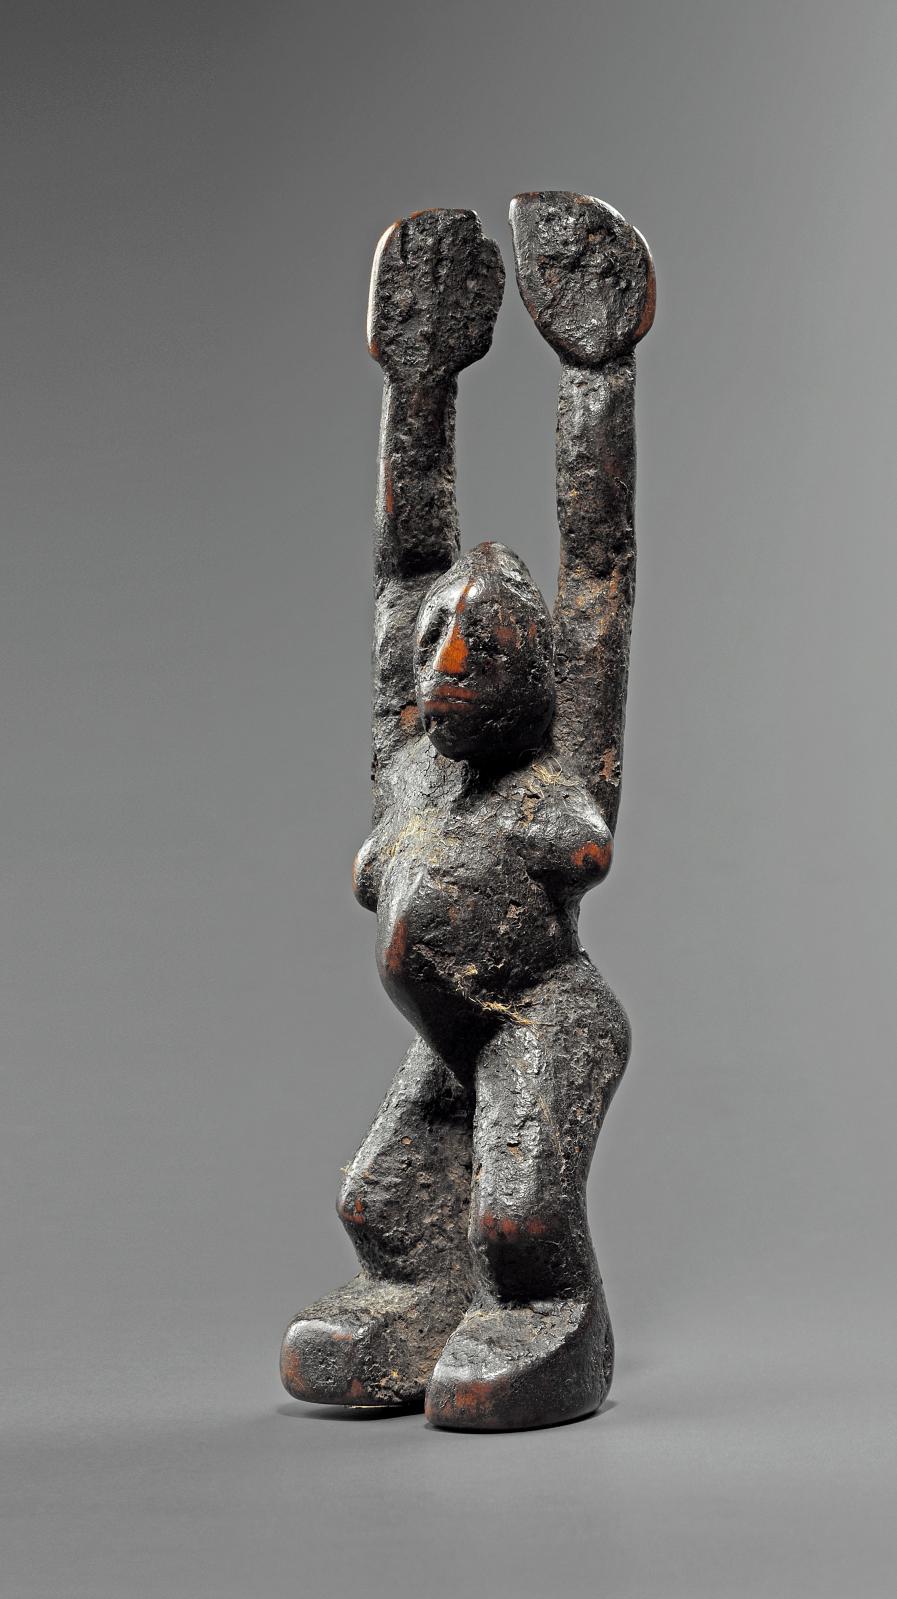 Burkina Faso, Lobi Buthib statuette, dagara-lobr style, wood, h. 17 cm.Estimate: €20,000/30,000.